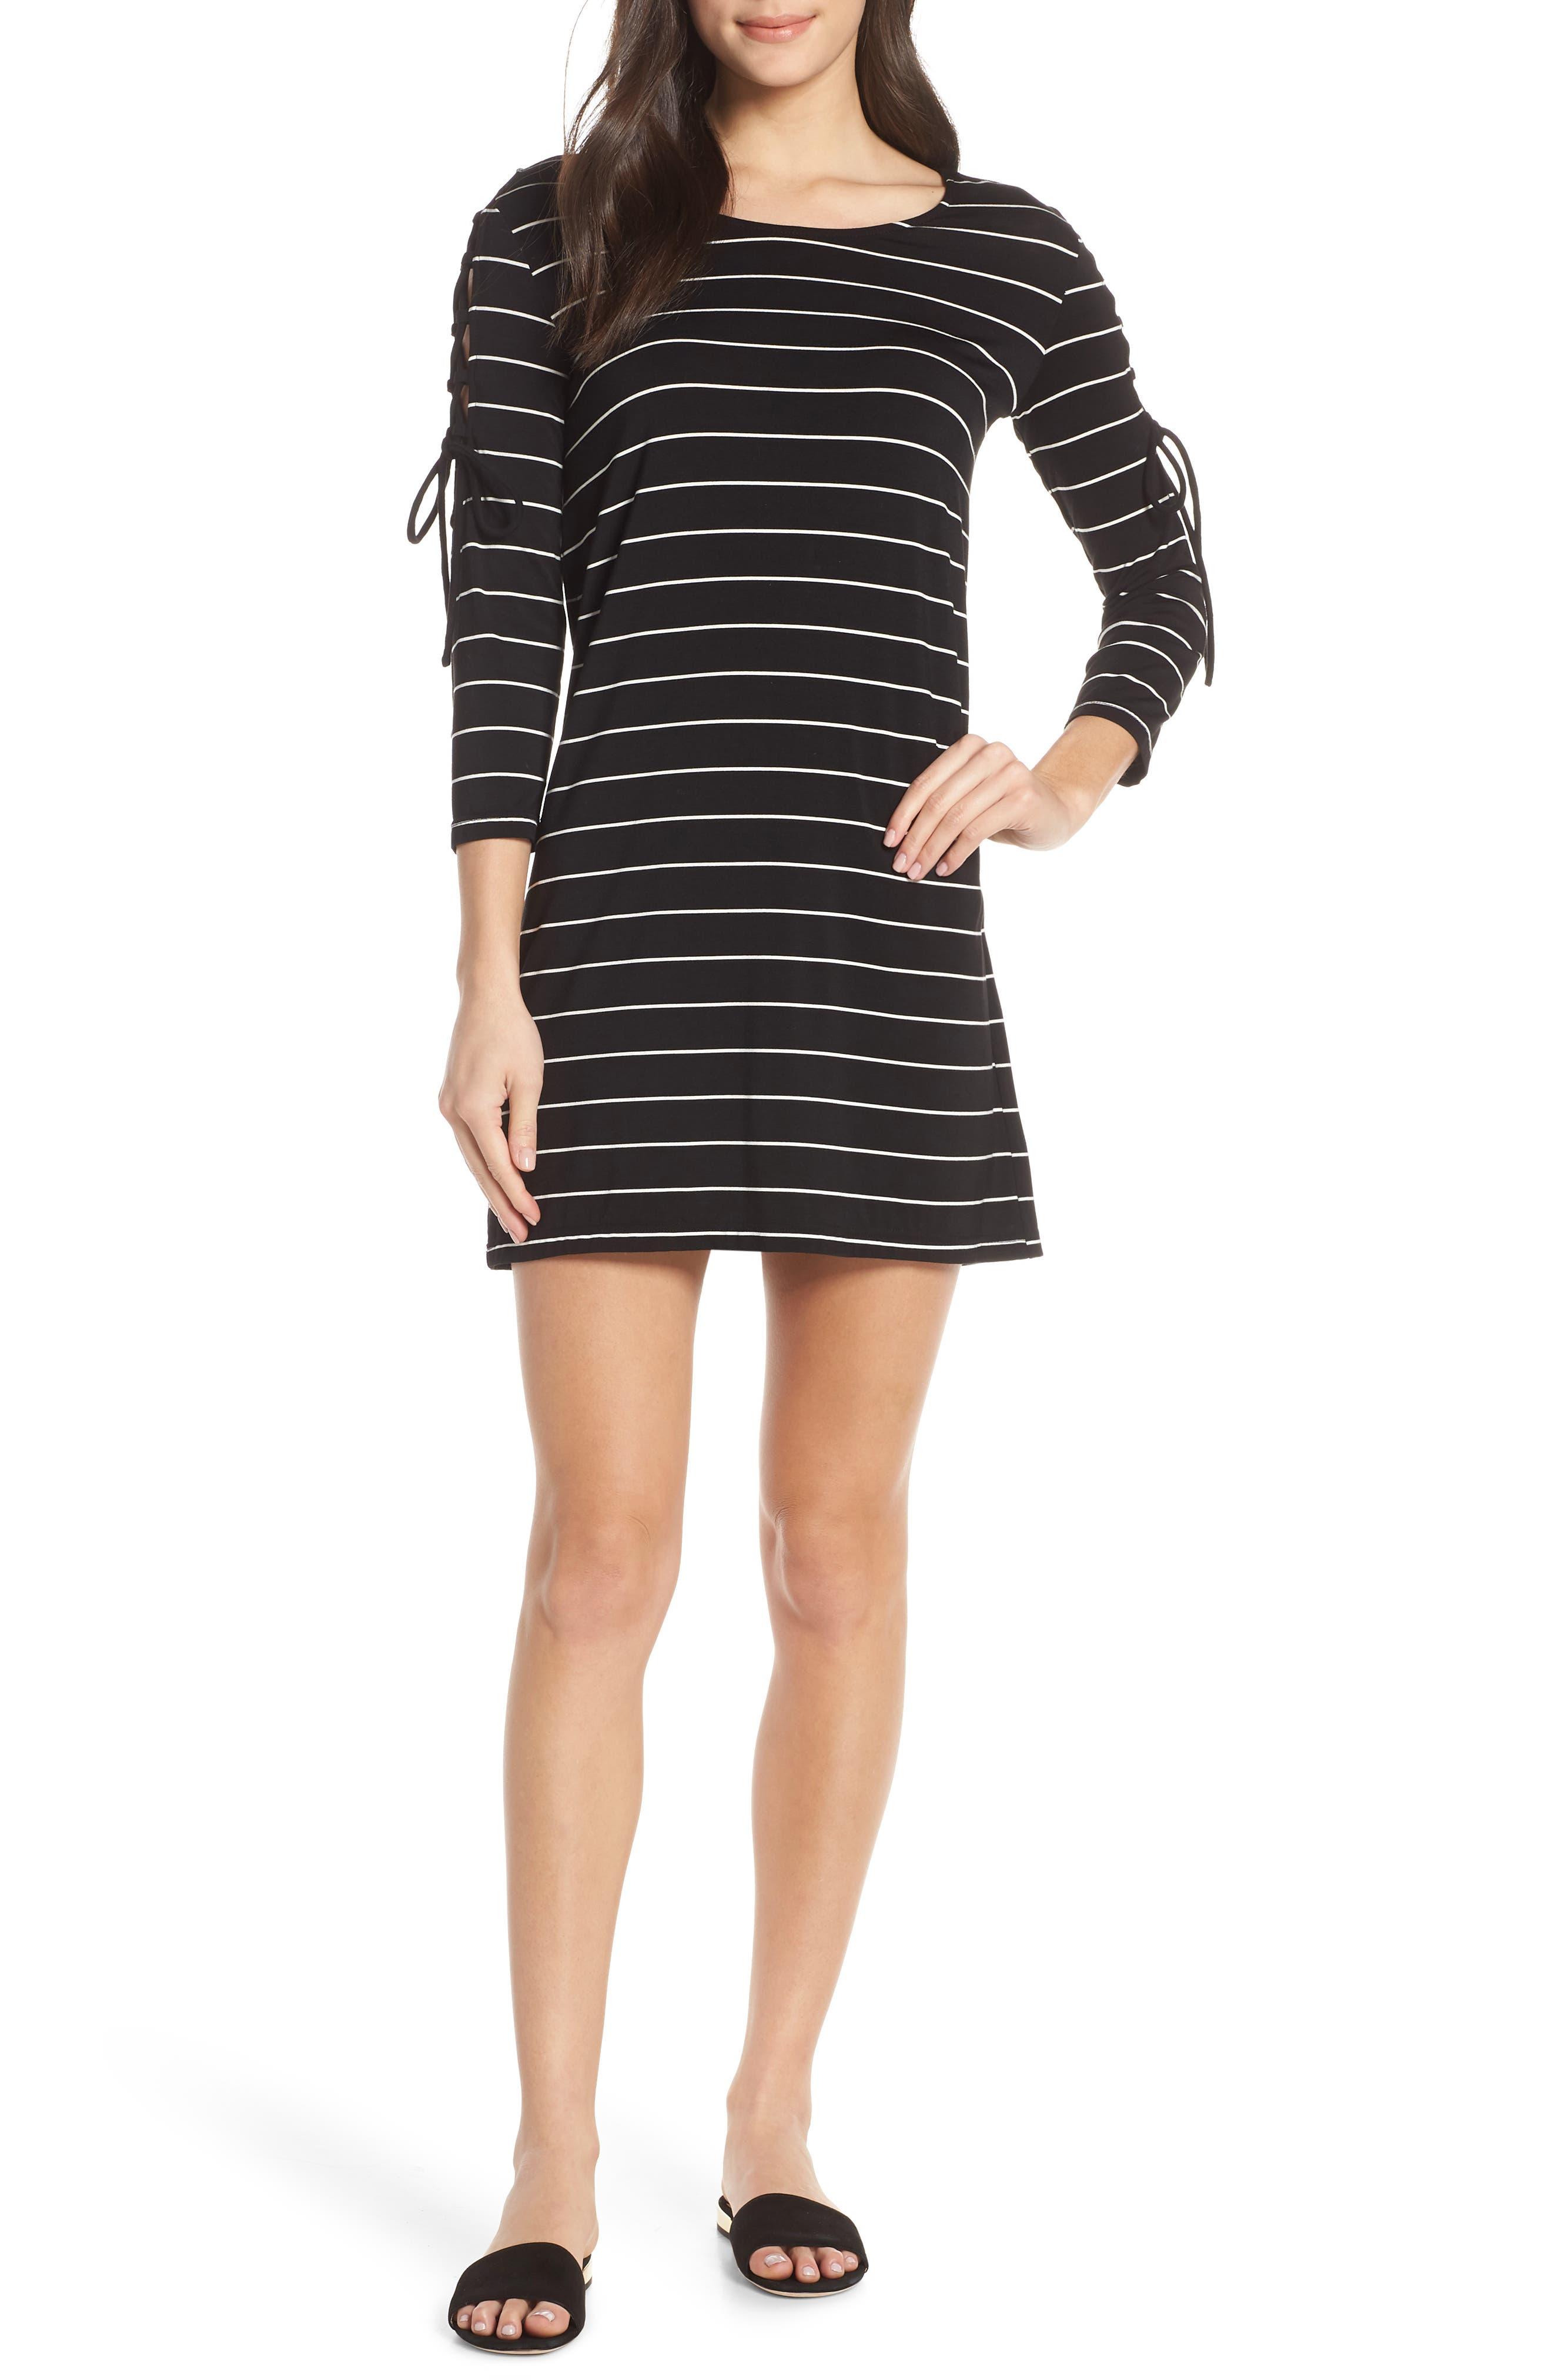 Bb Dakota Here Kitty, Kitty Stripe Lace-Up Sleeve Dress, Black